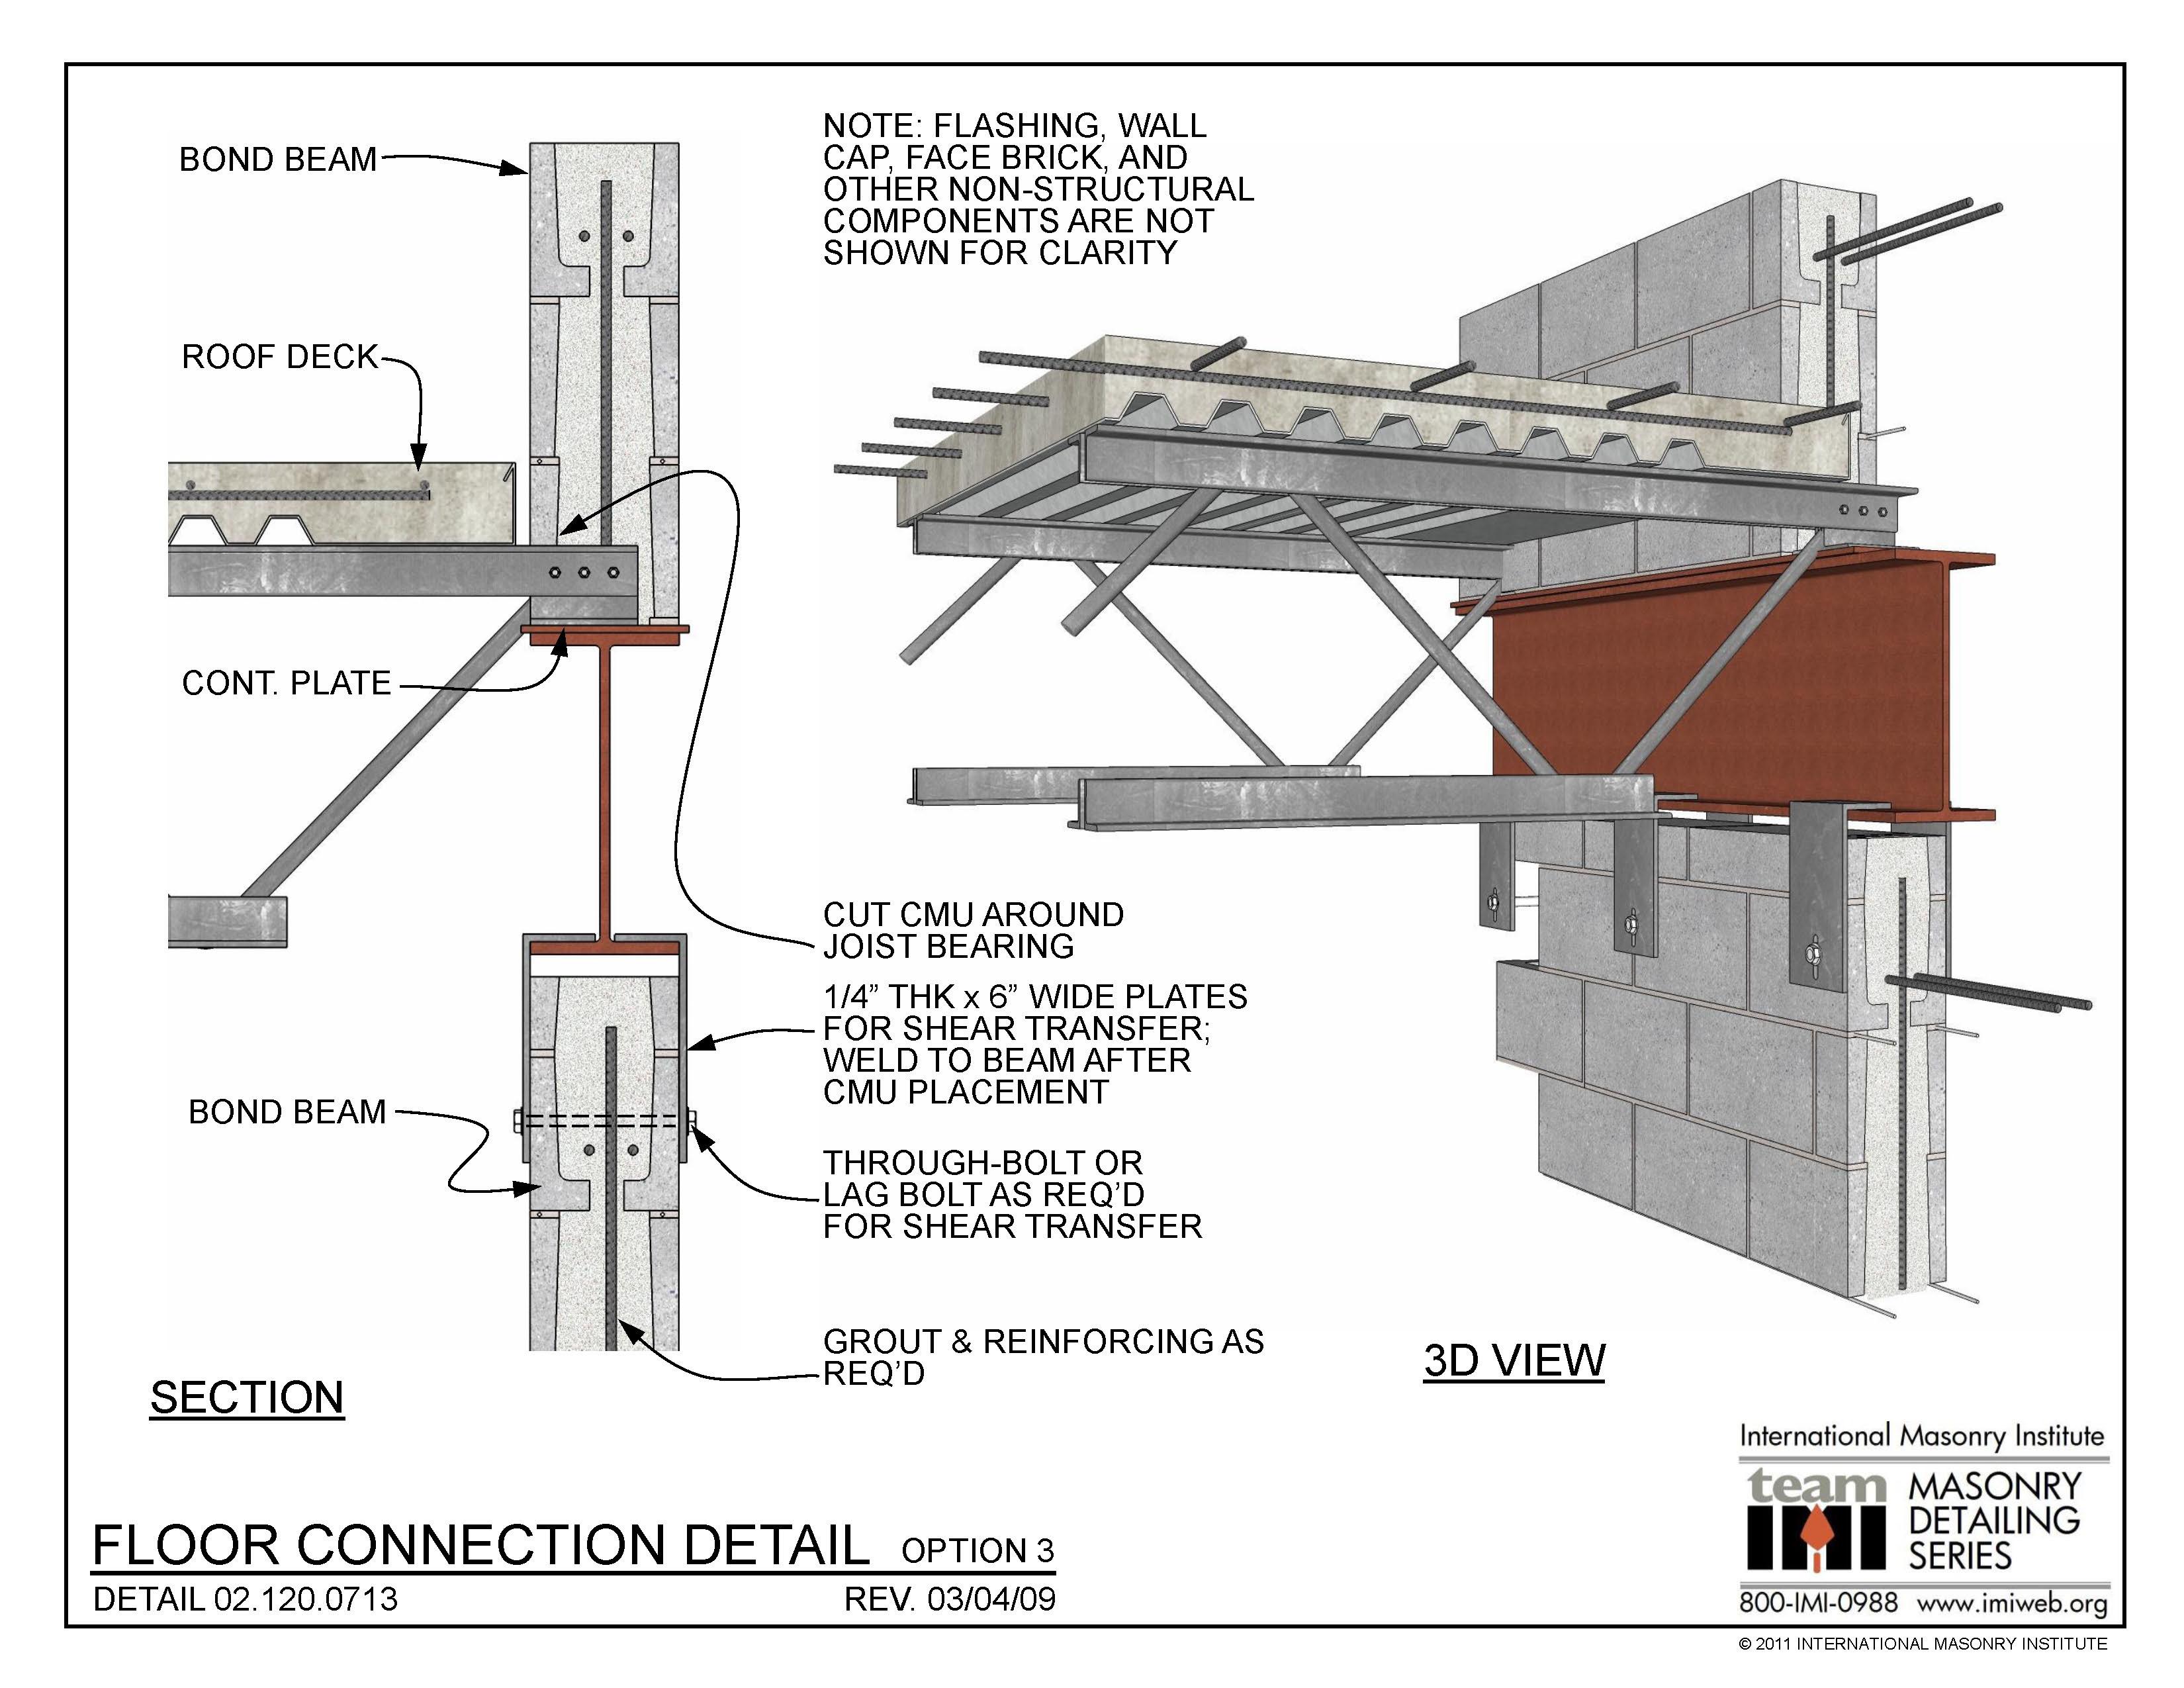 02 120 0713 Floor Connection Detail Option 3